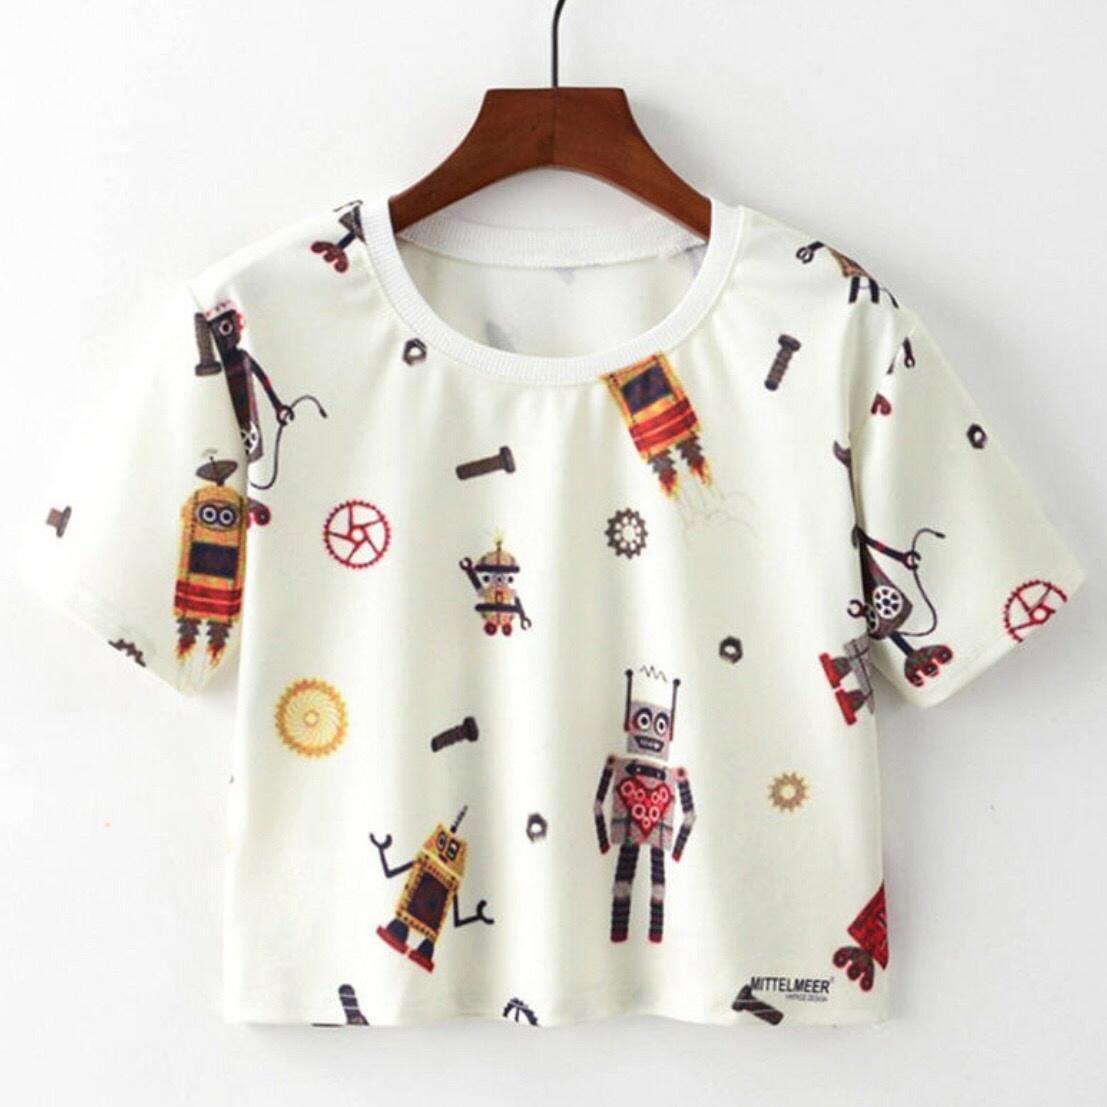 Hoziro - Baju Atasan Tshirt Kaos Crop Wanita Machine Tee Bahan Spandek